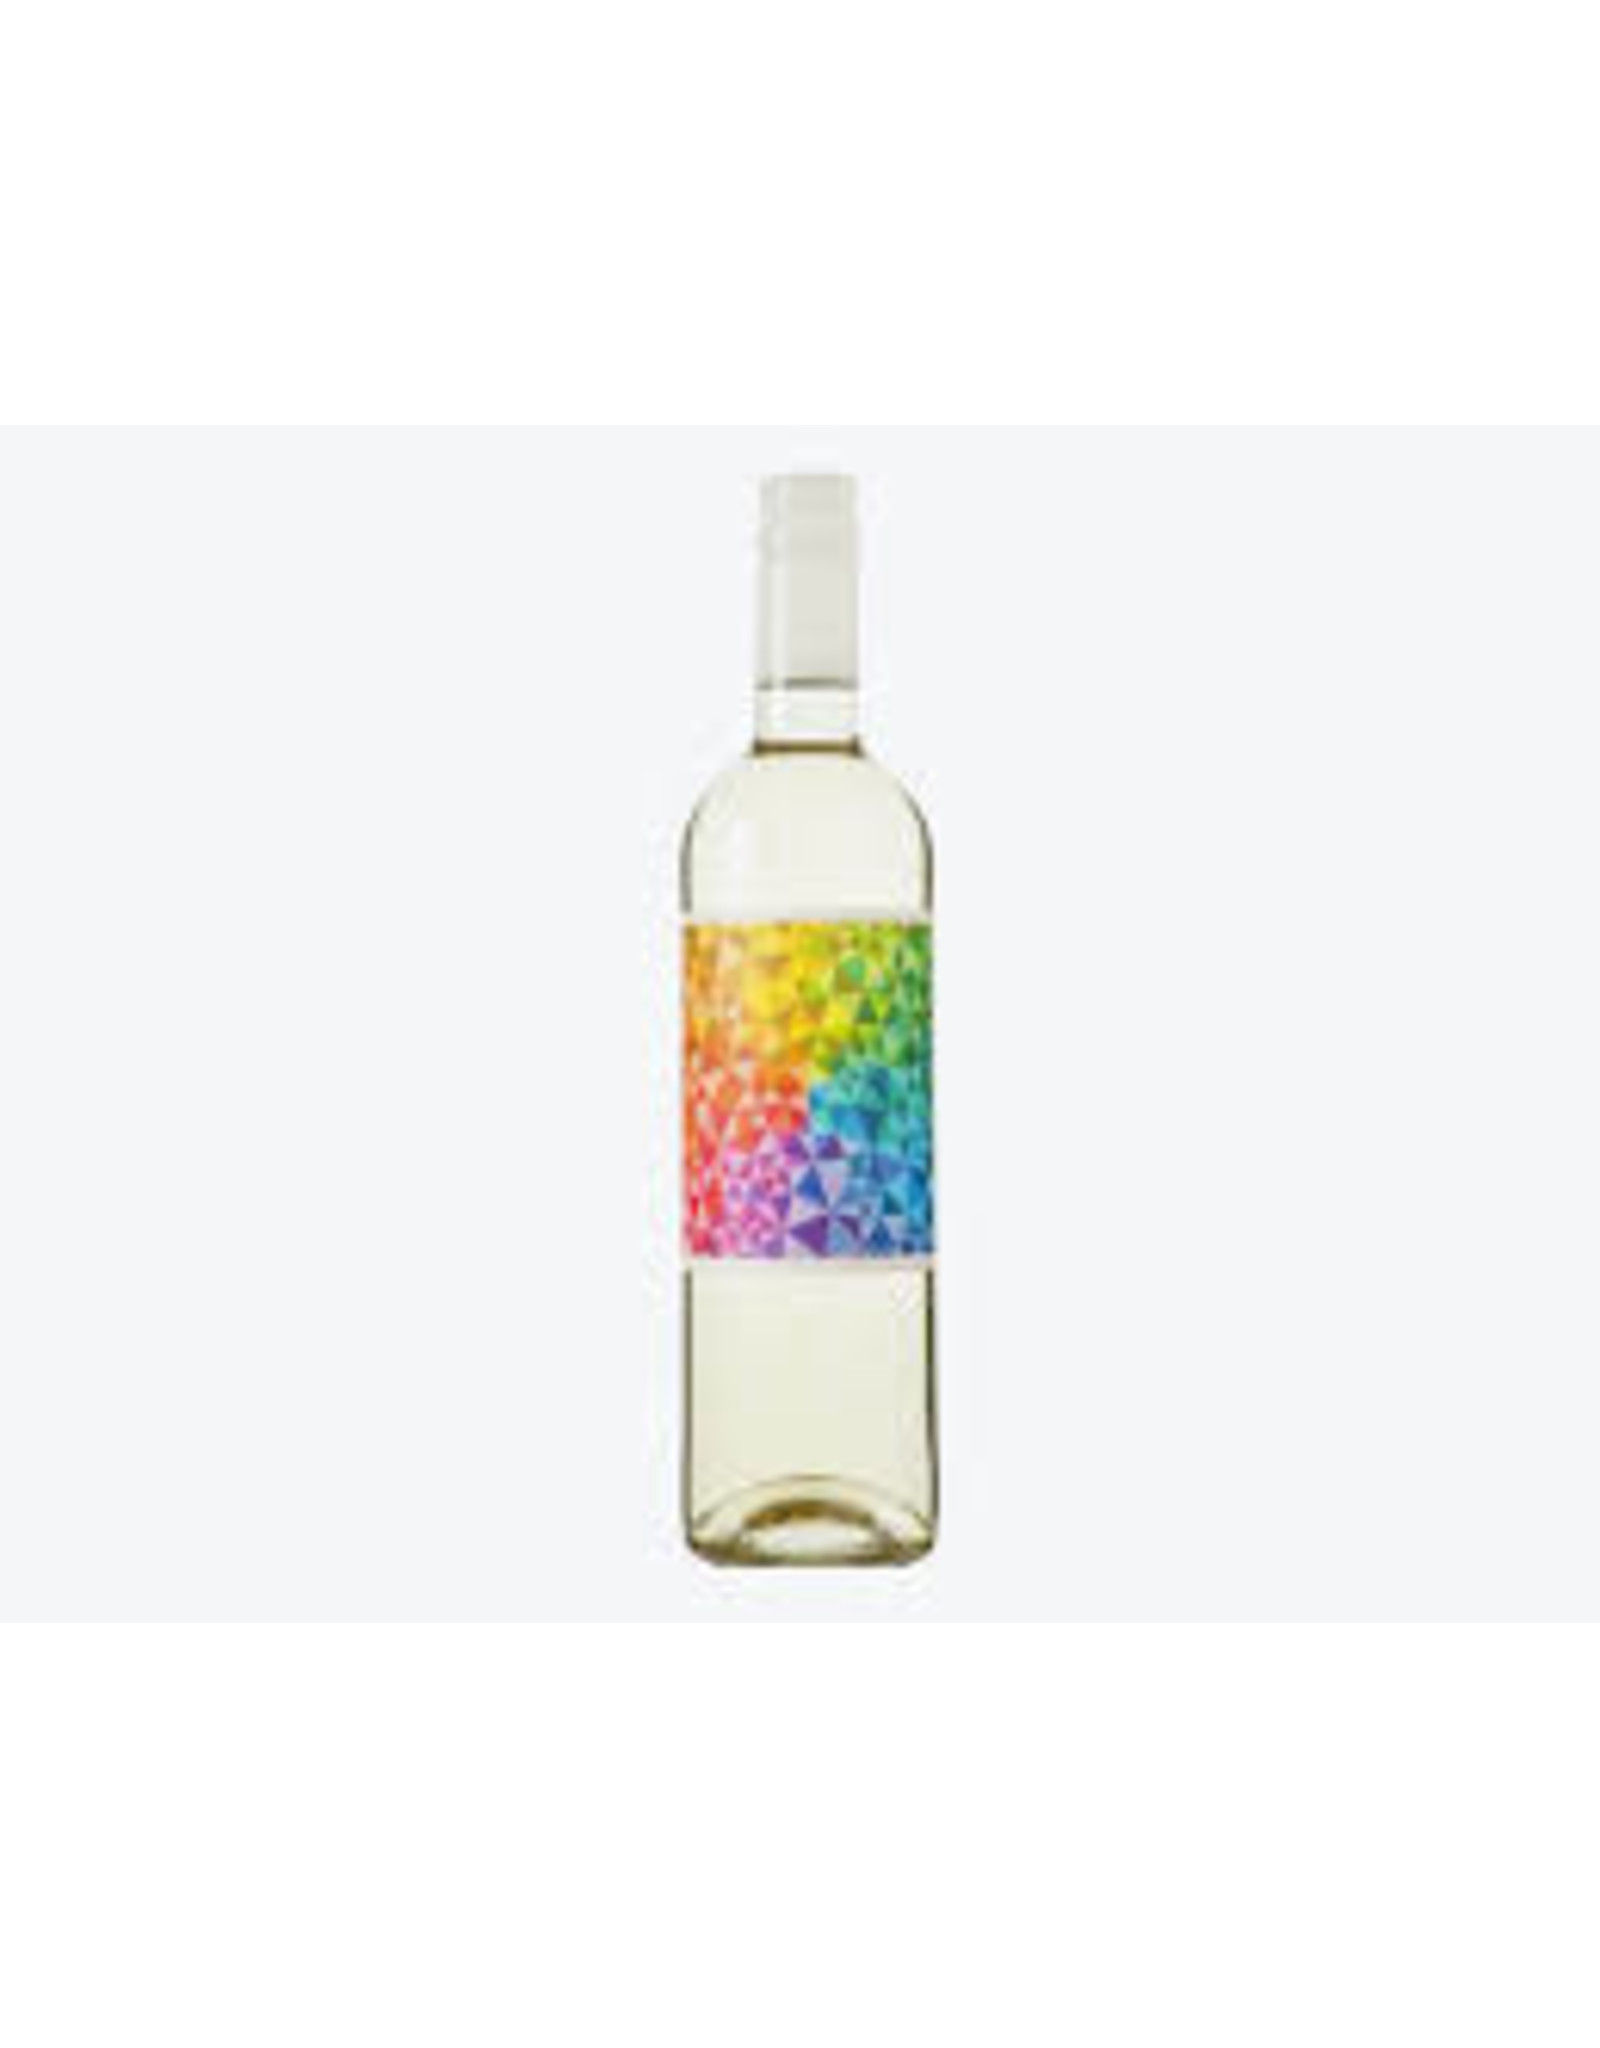 Prisma Sauvignon Blanc